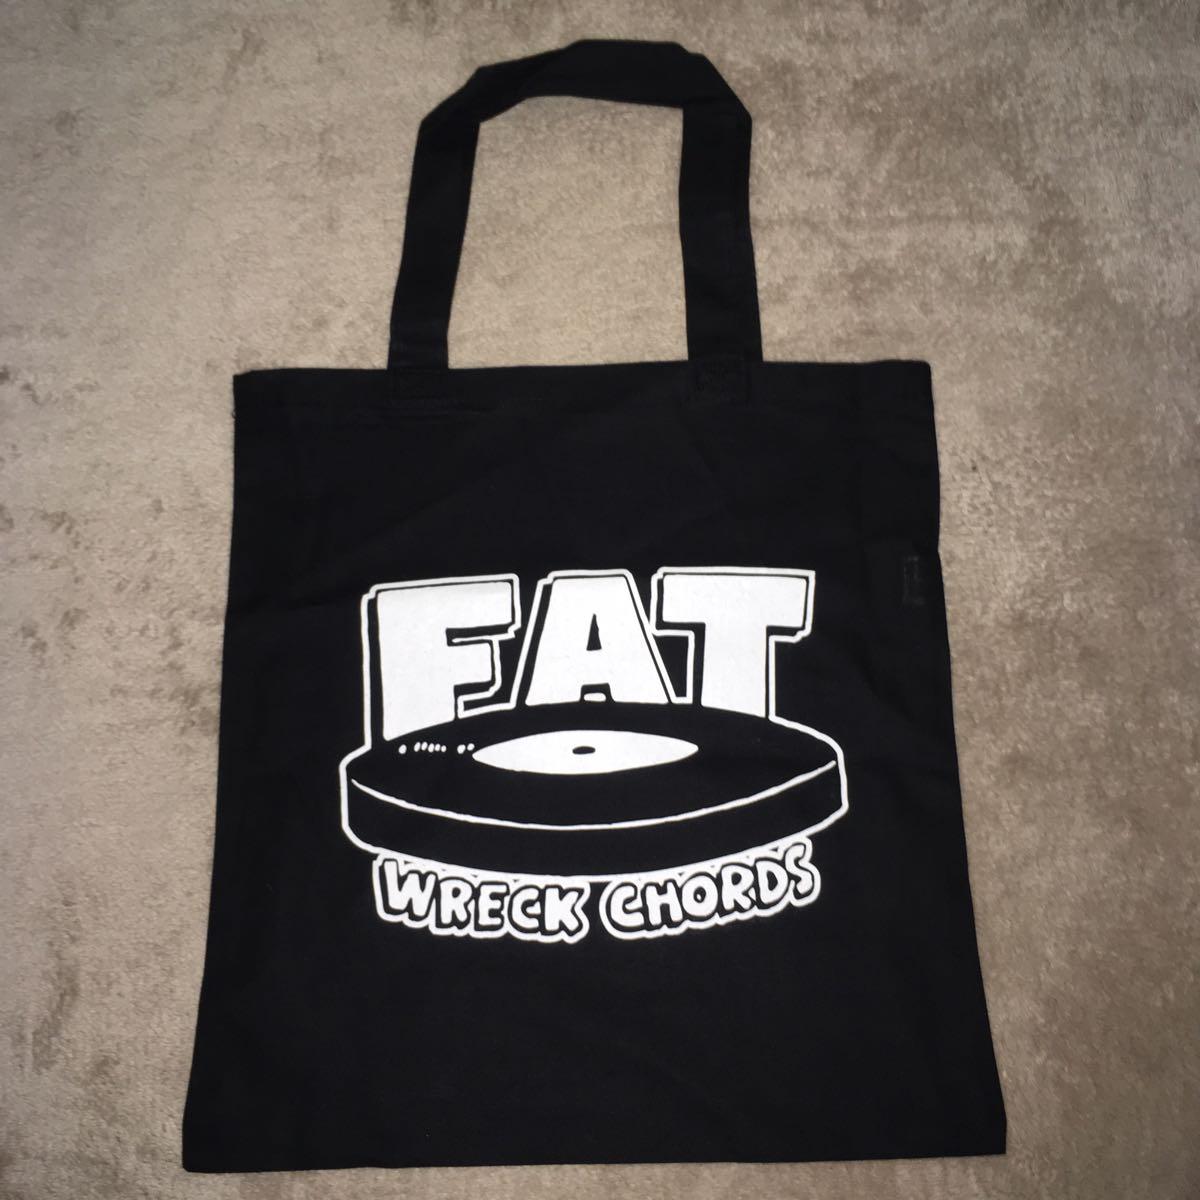 FAT WRECK CHORDS トートバッグ / nofx hi standard wanima pizza of death